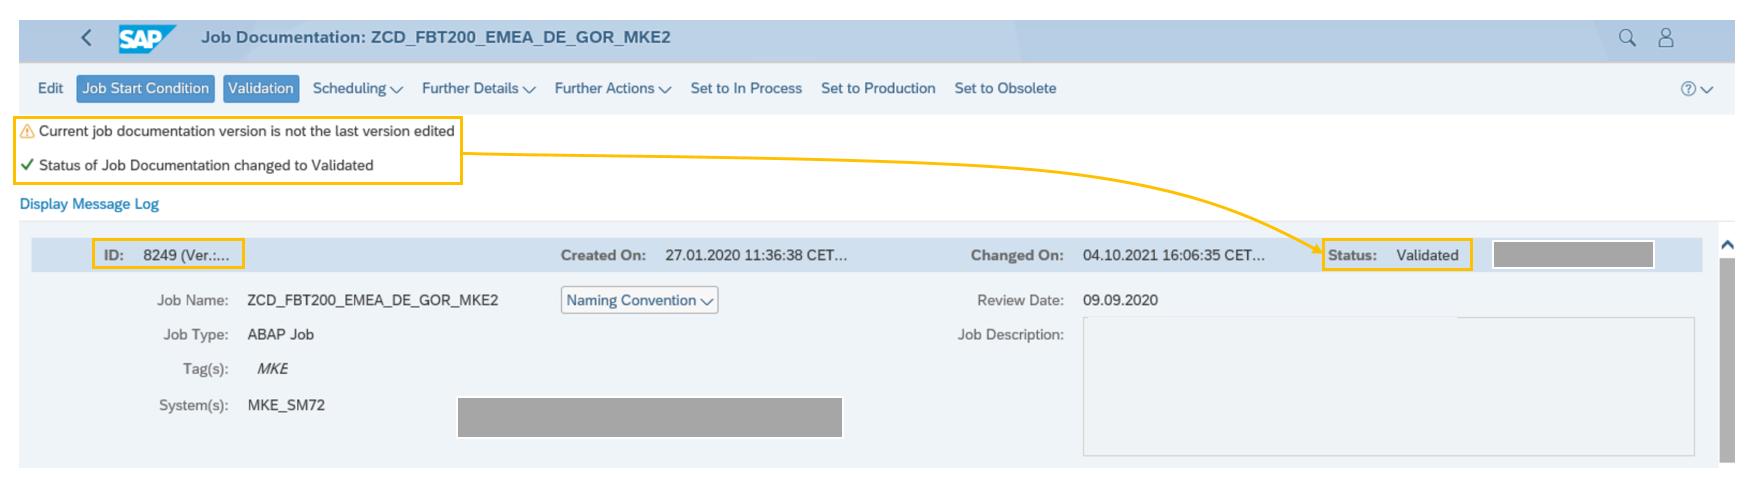 Job%20Documentation%20Versioning%20as%20of%20SP11